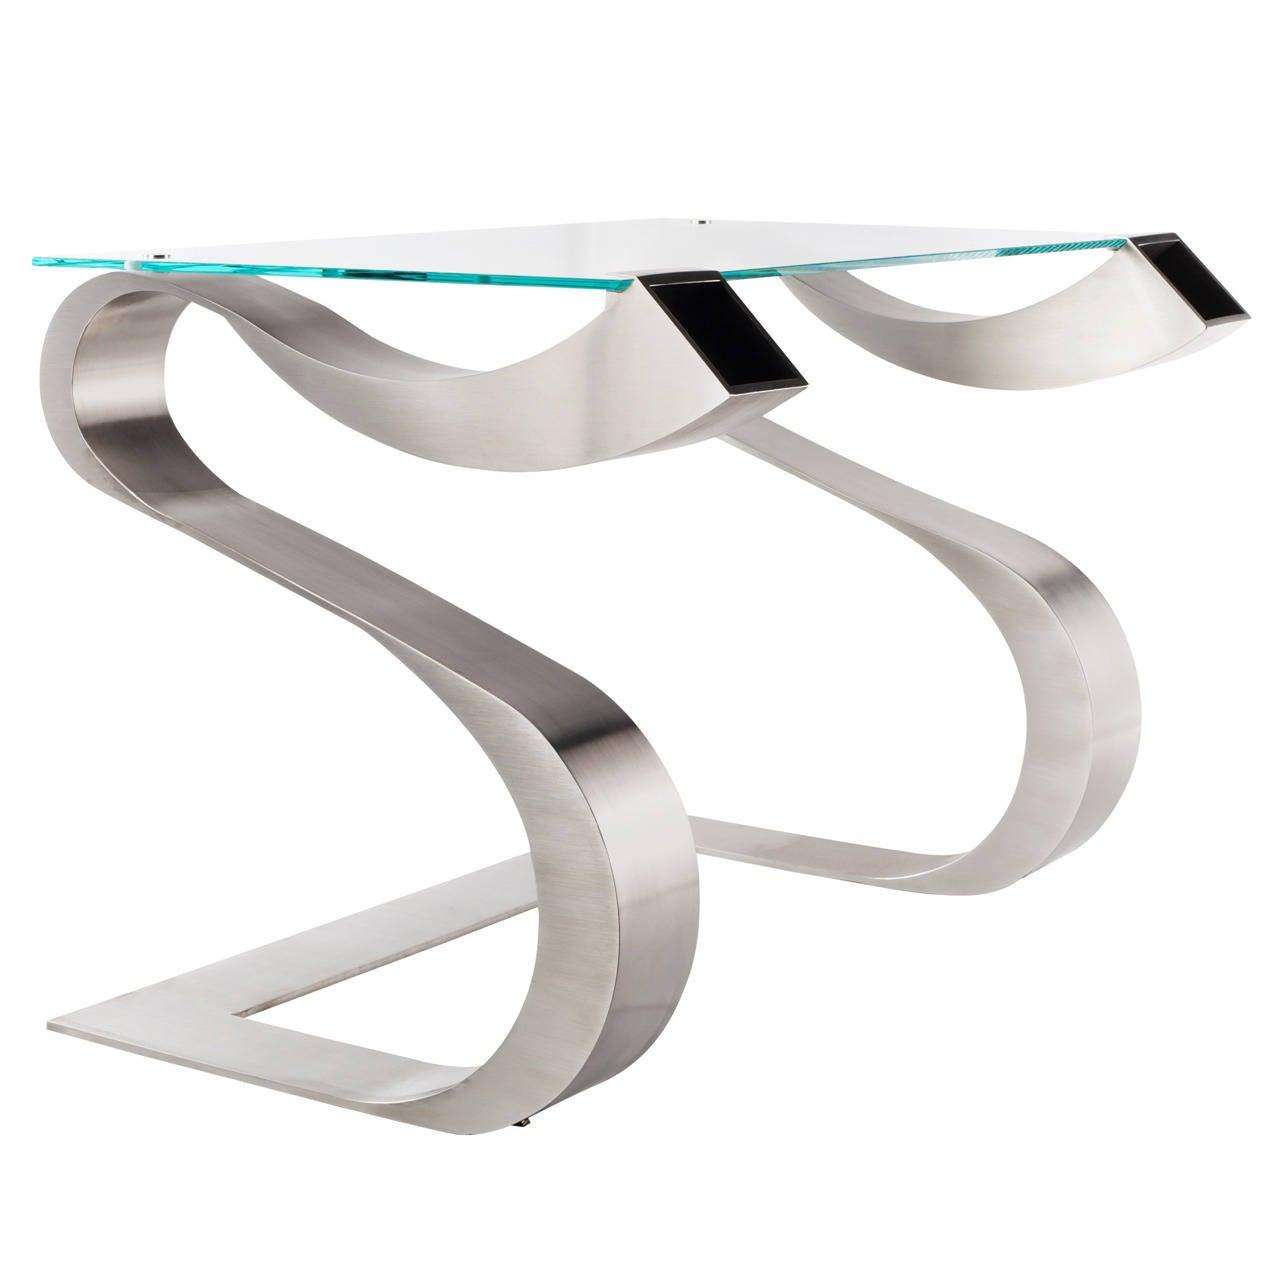 Cobra Desk, Designed by Laurie Beckerman in 2008